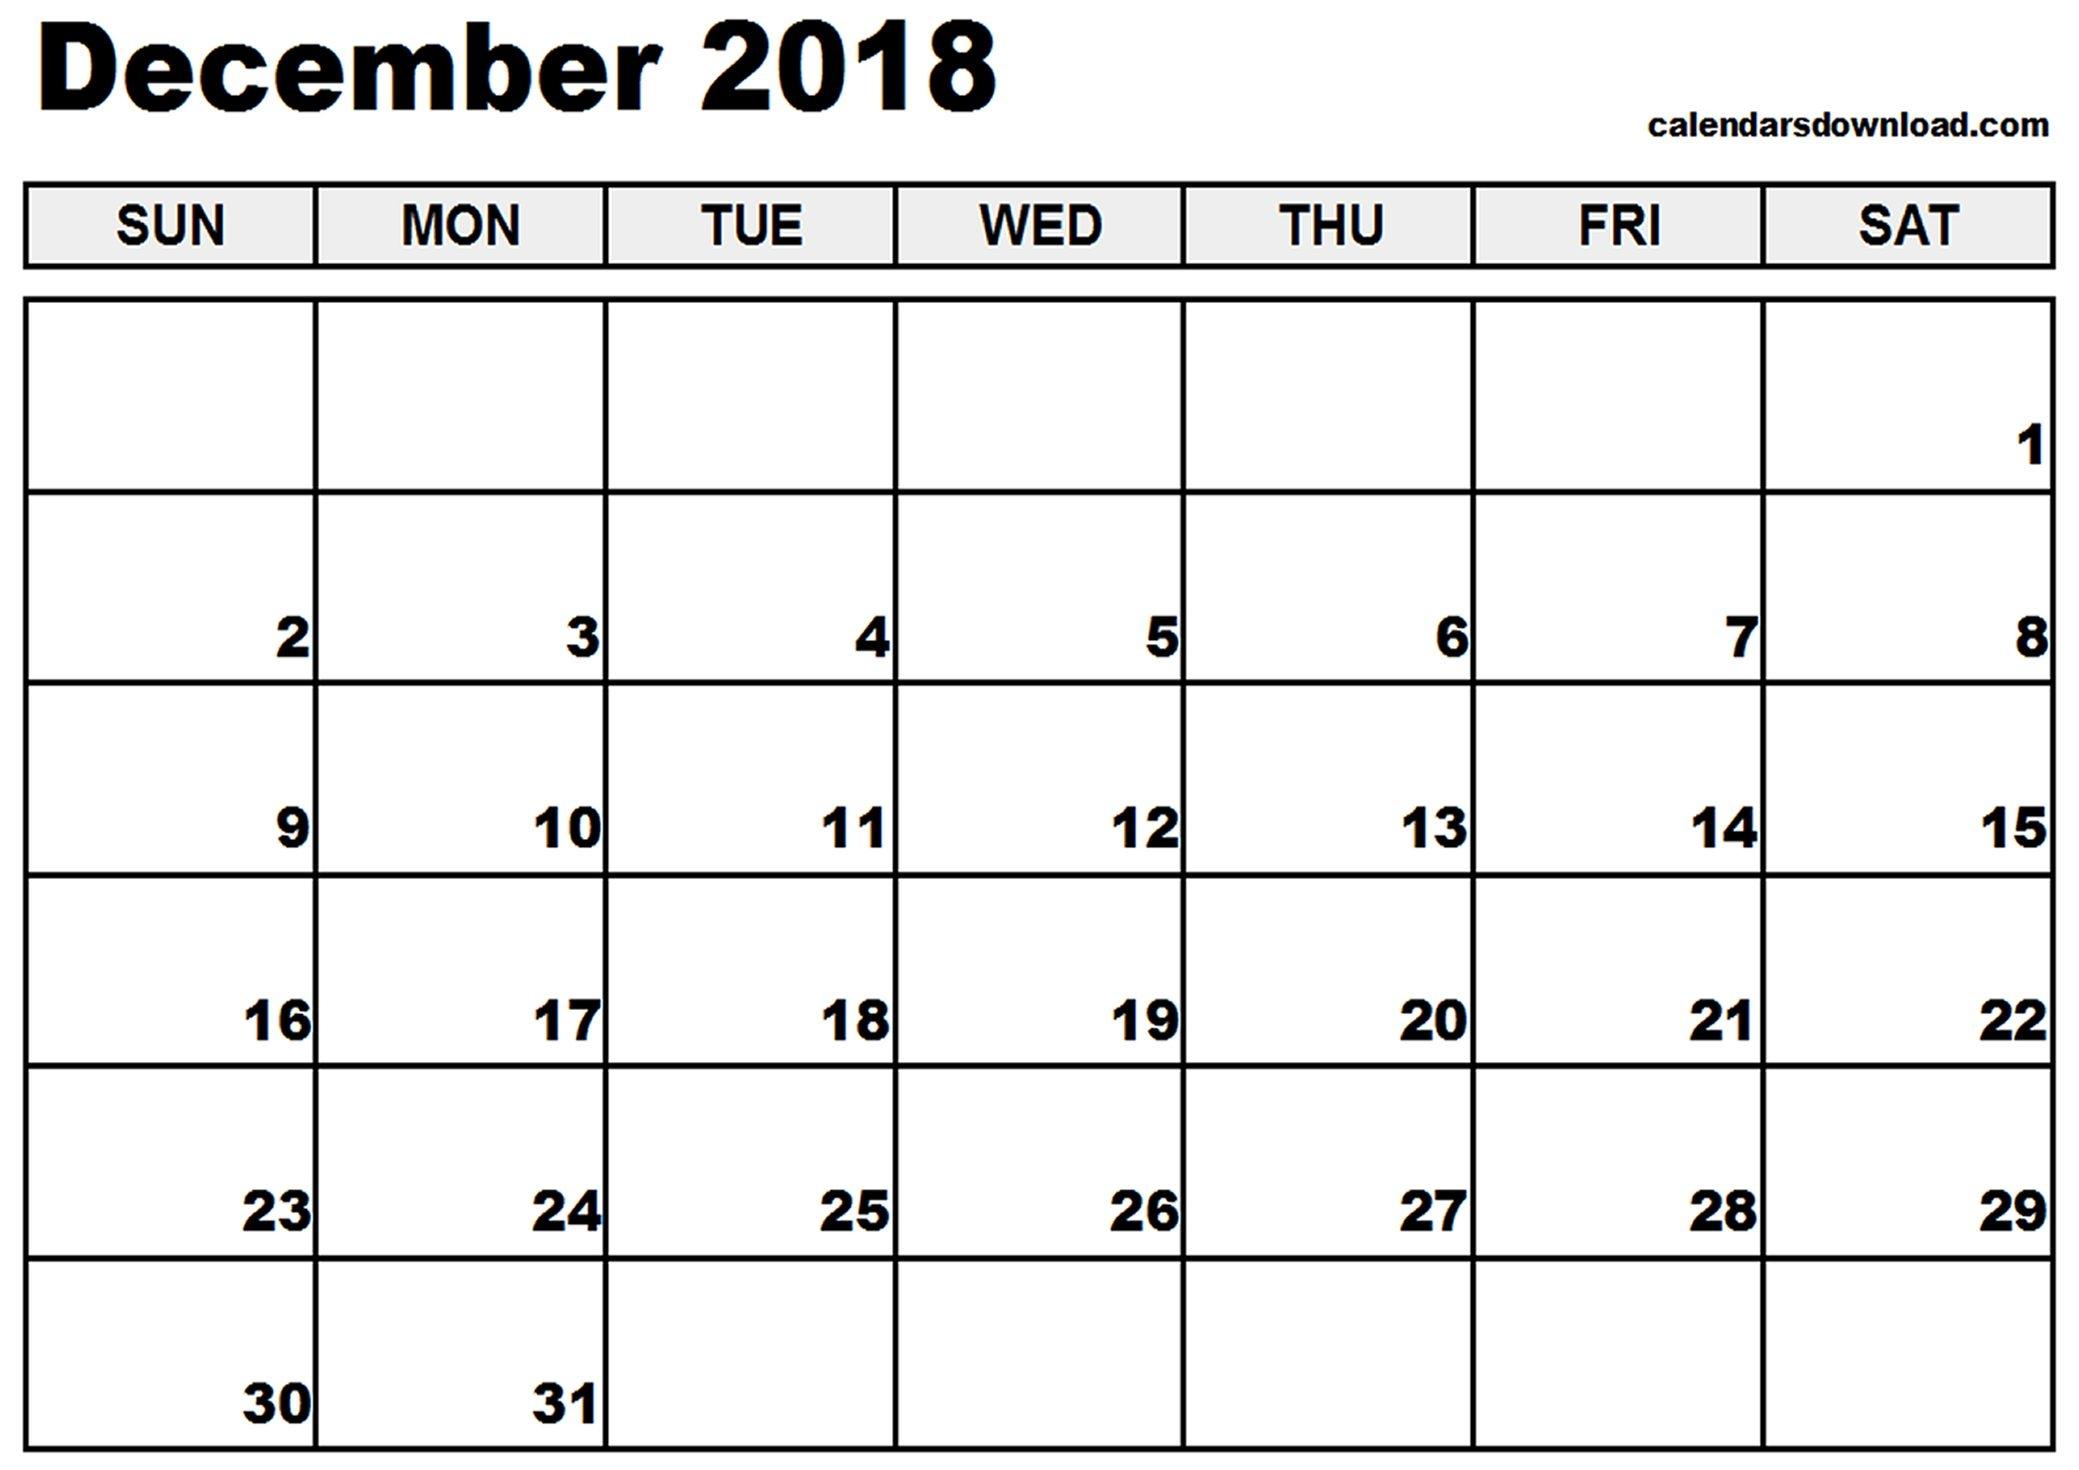 December 2018 Calendar Canada Pdf - Printable Calendar 2019